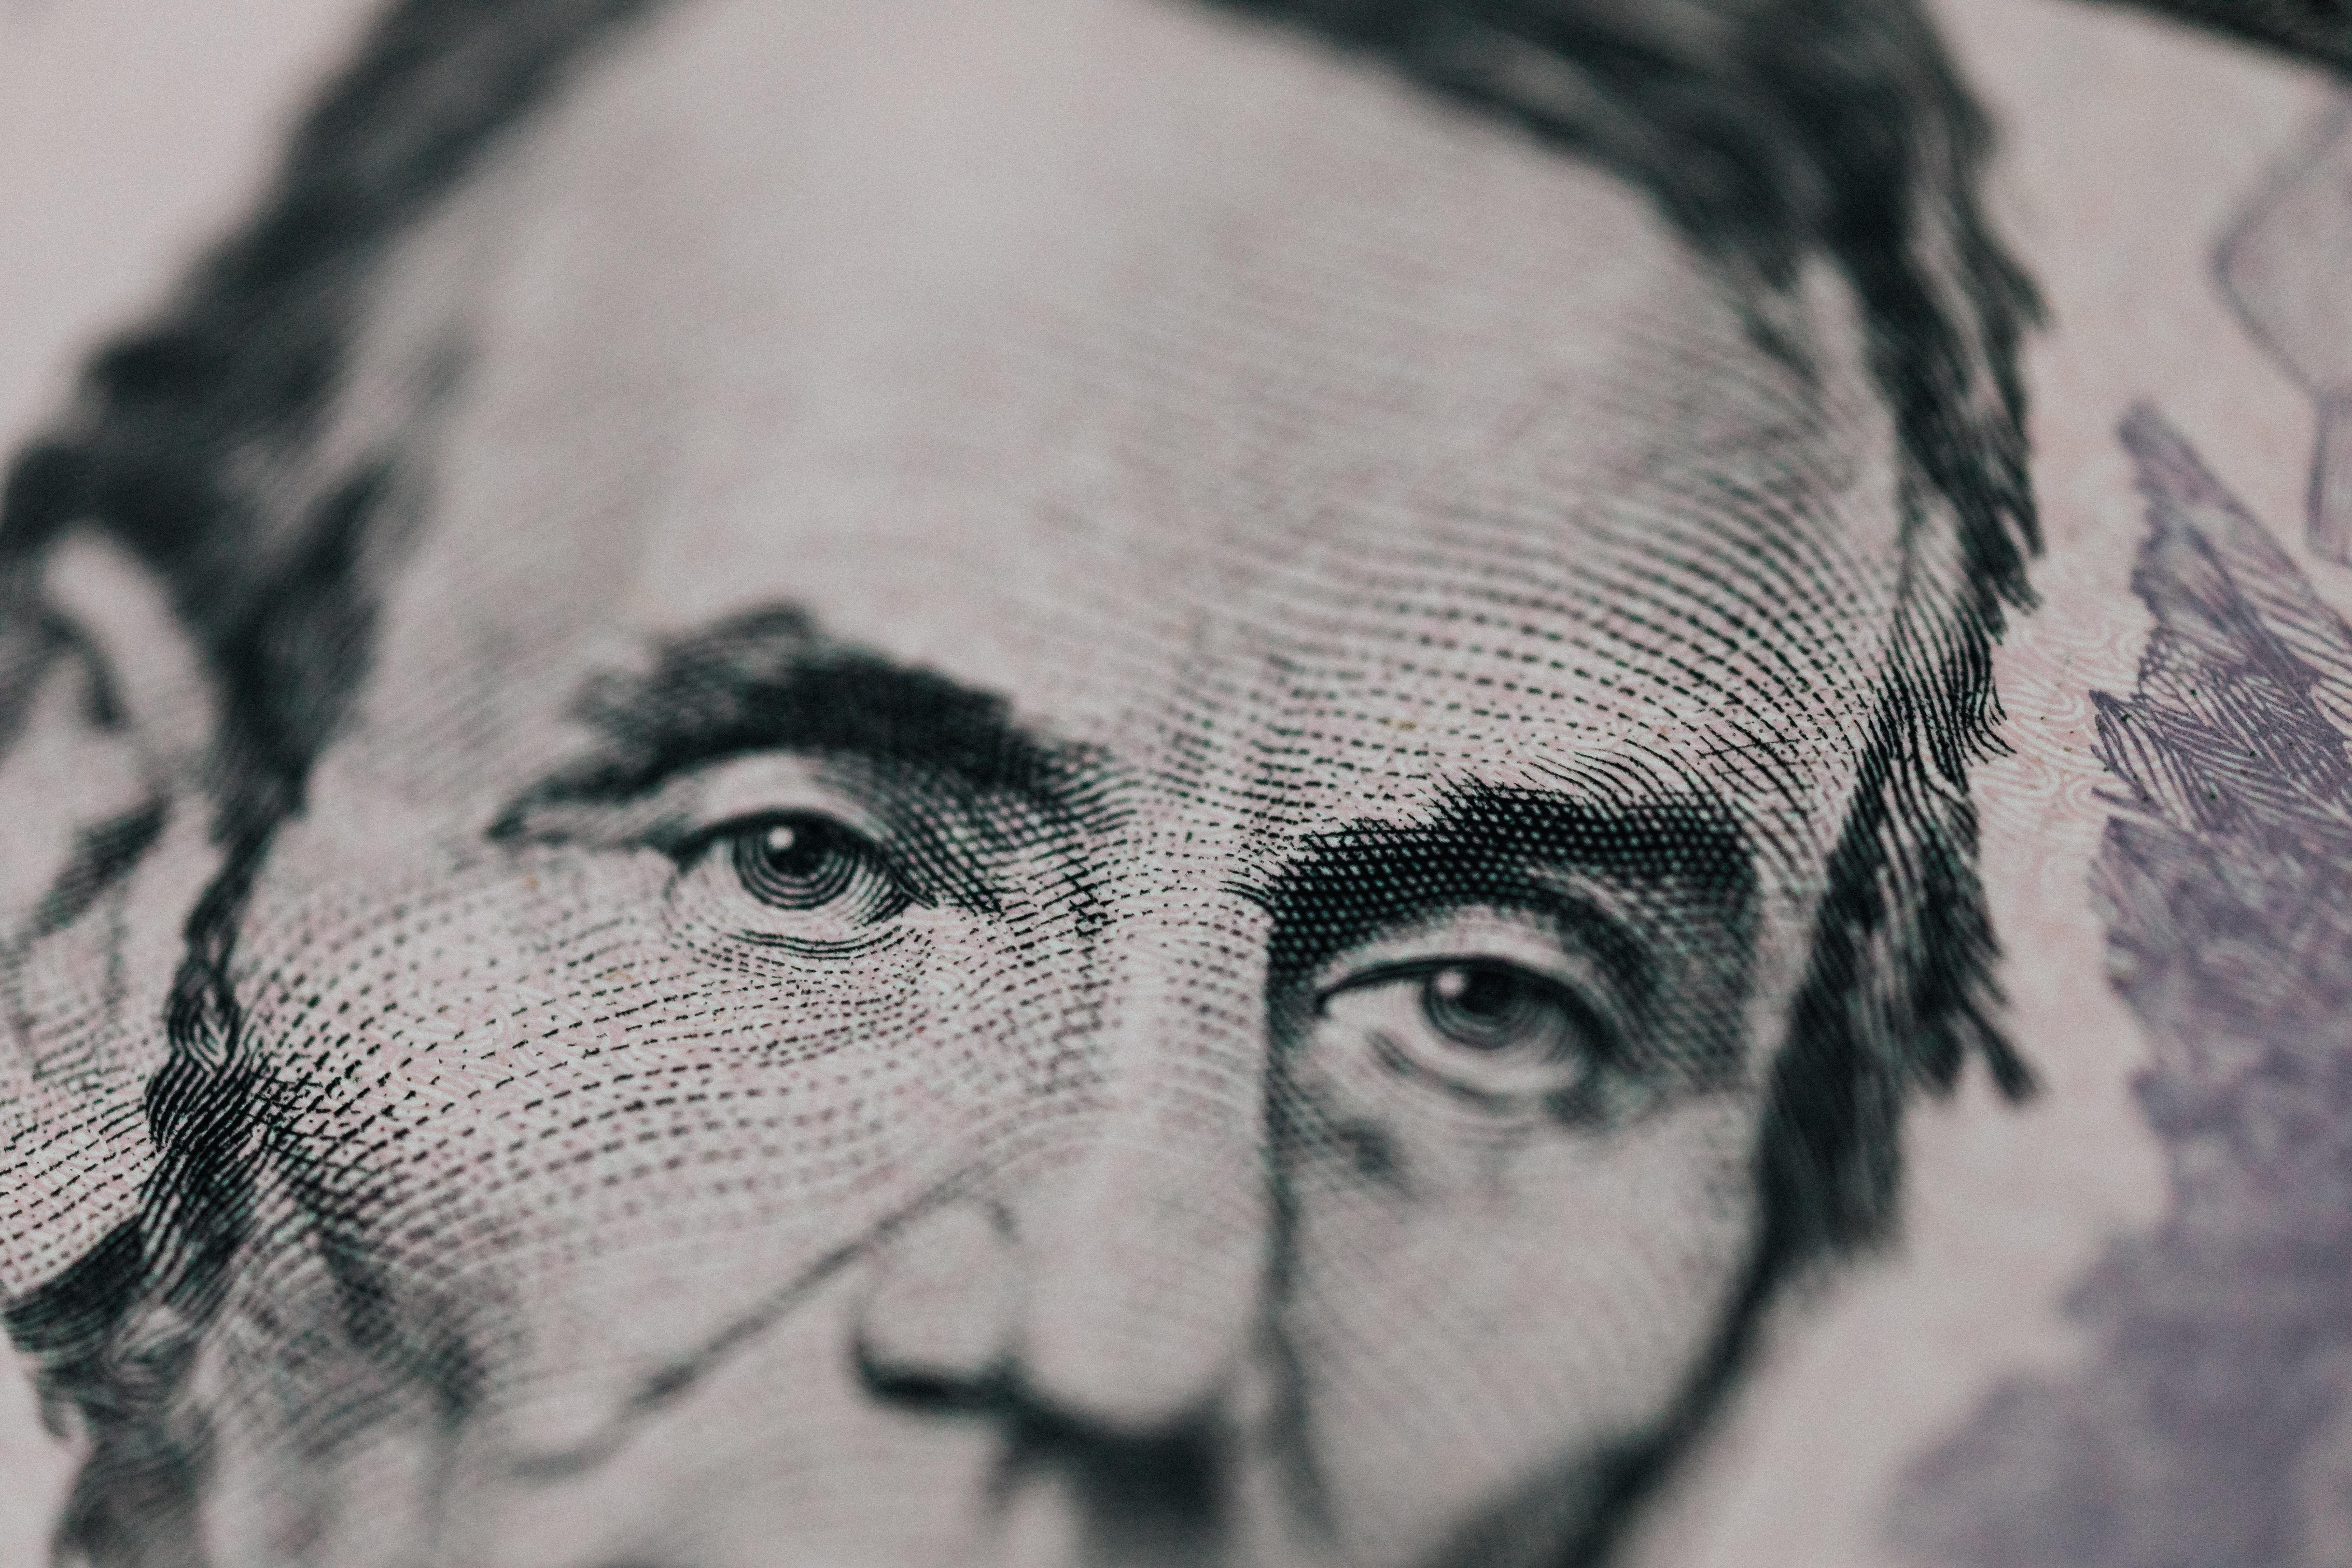 New Round of Stimulus Checks Hit Americans' Bank Accounts